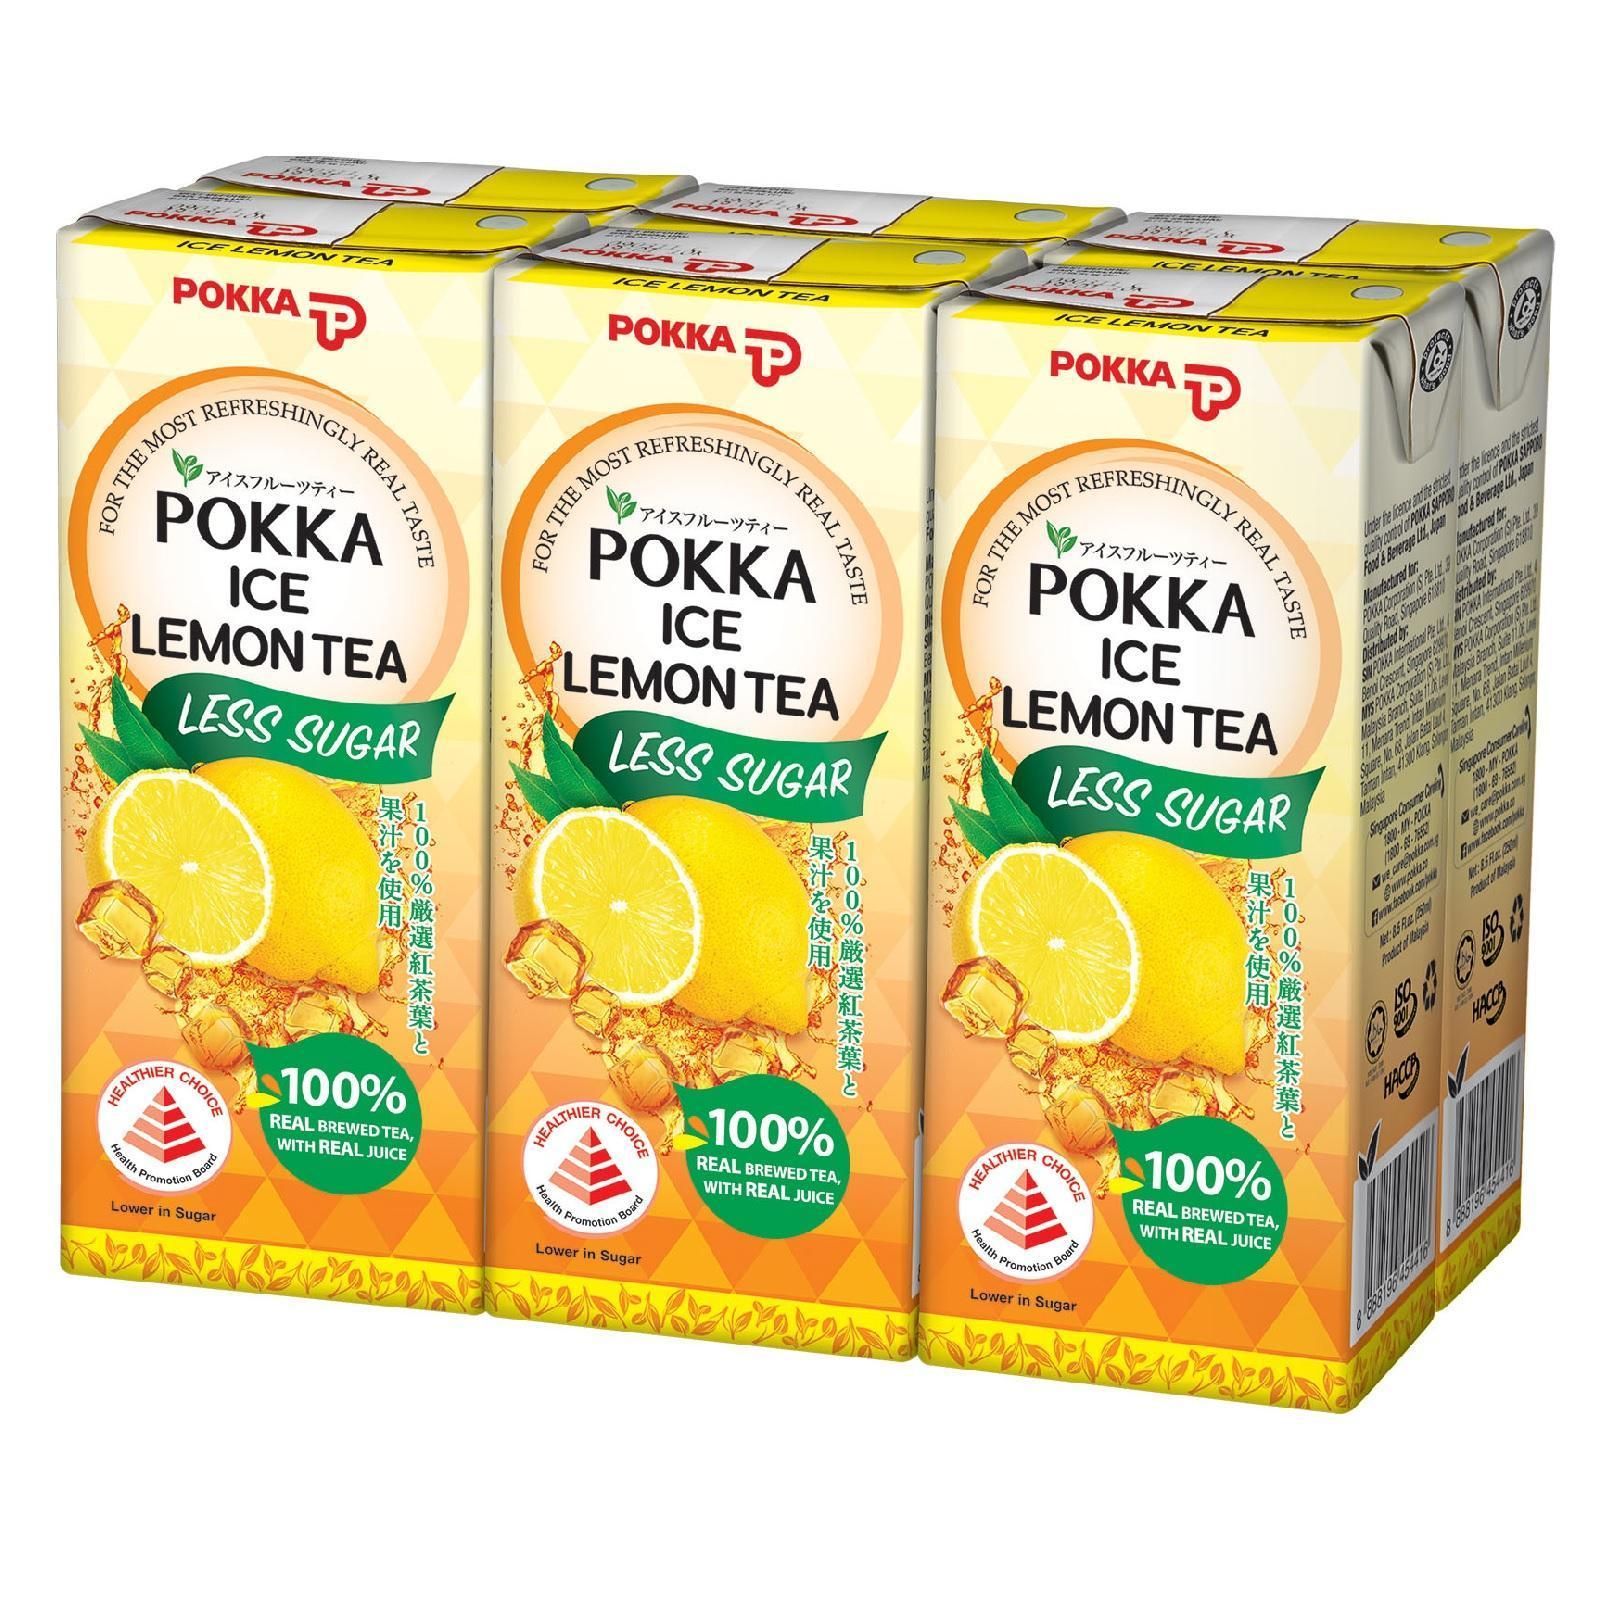 Pokka Ice Lemon Tea (Less Sugar)